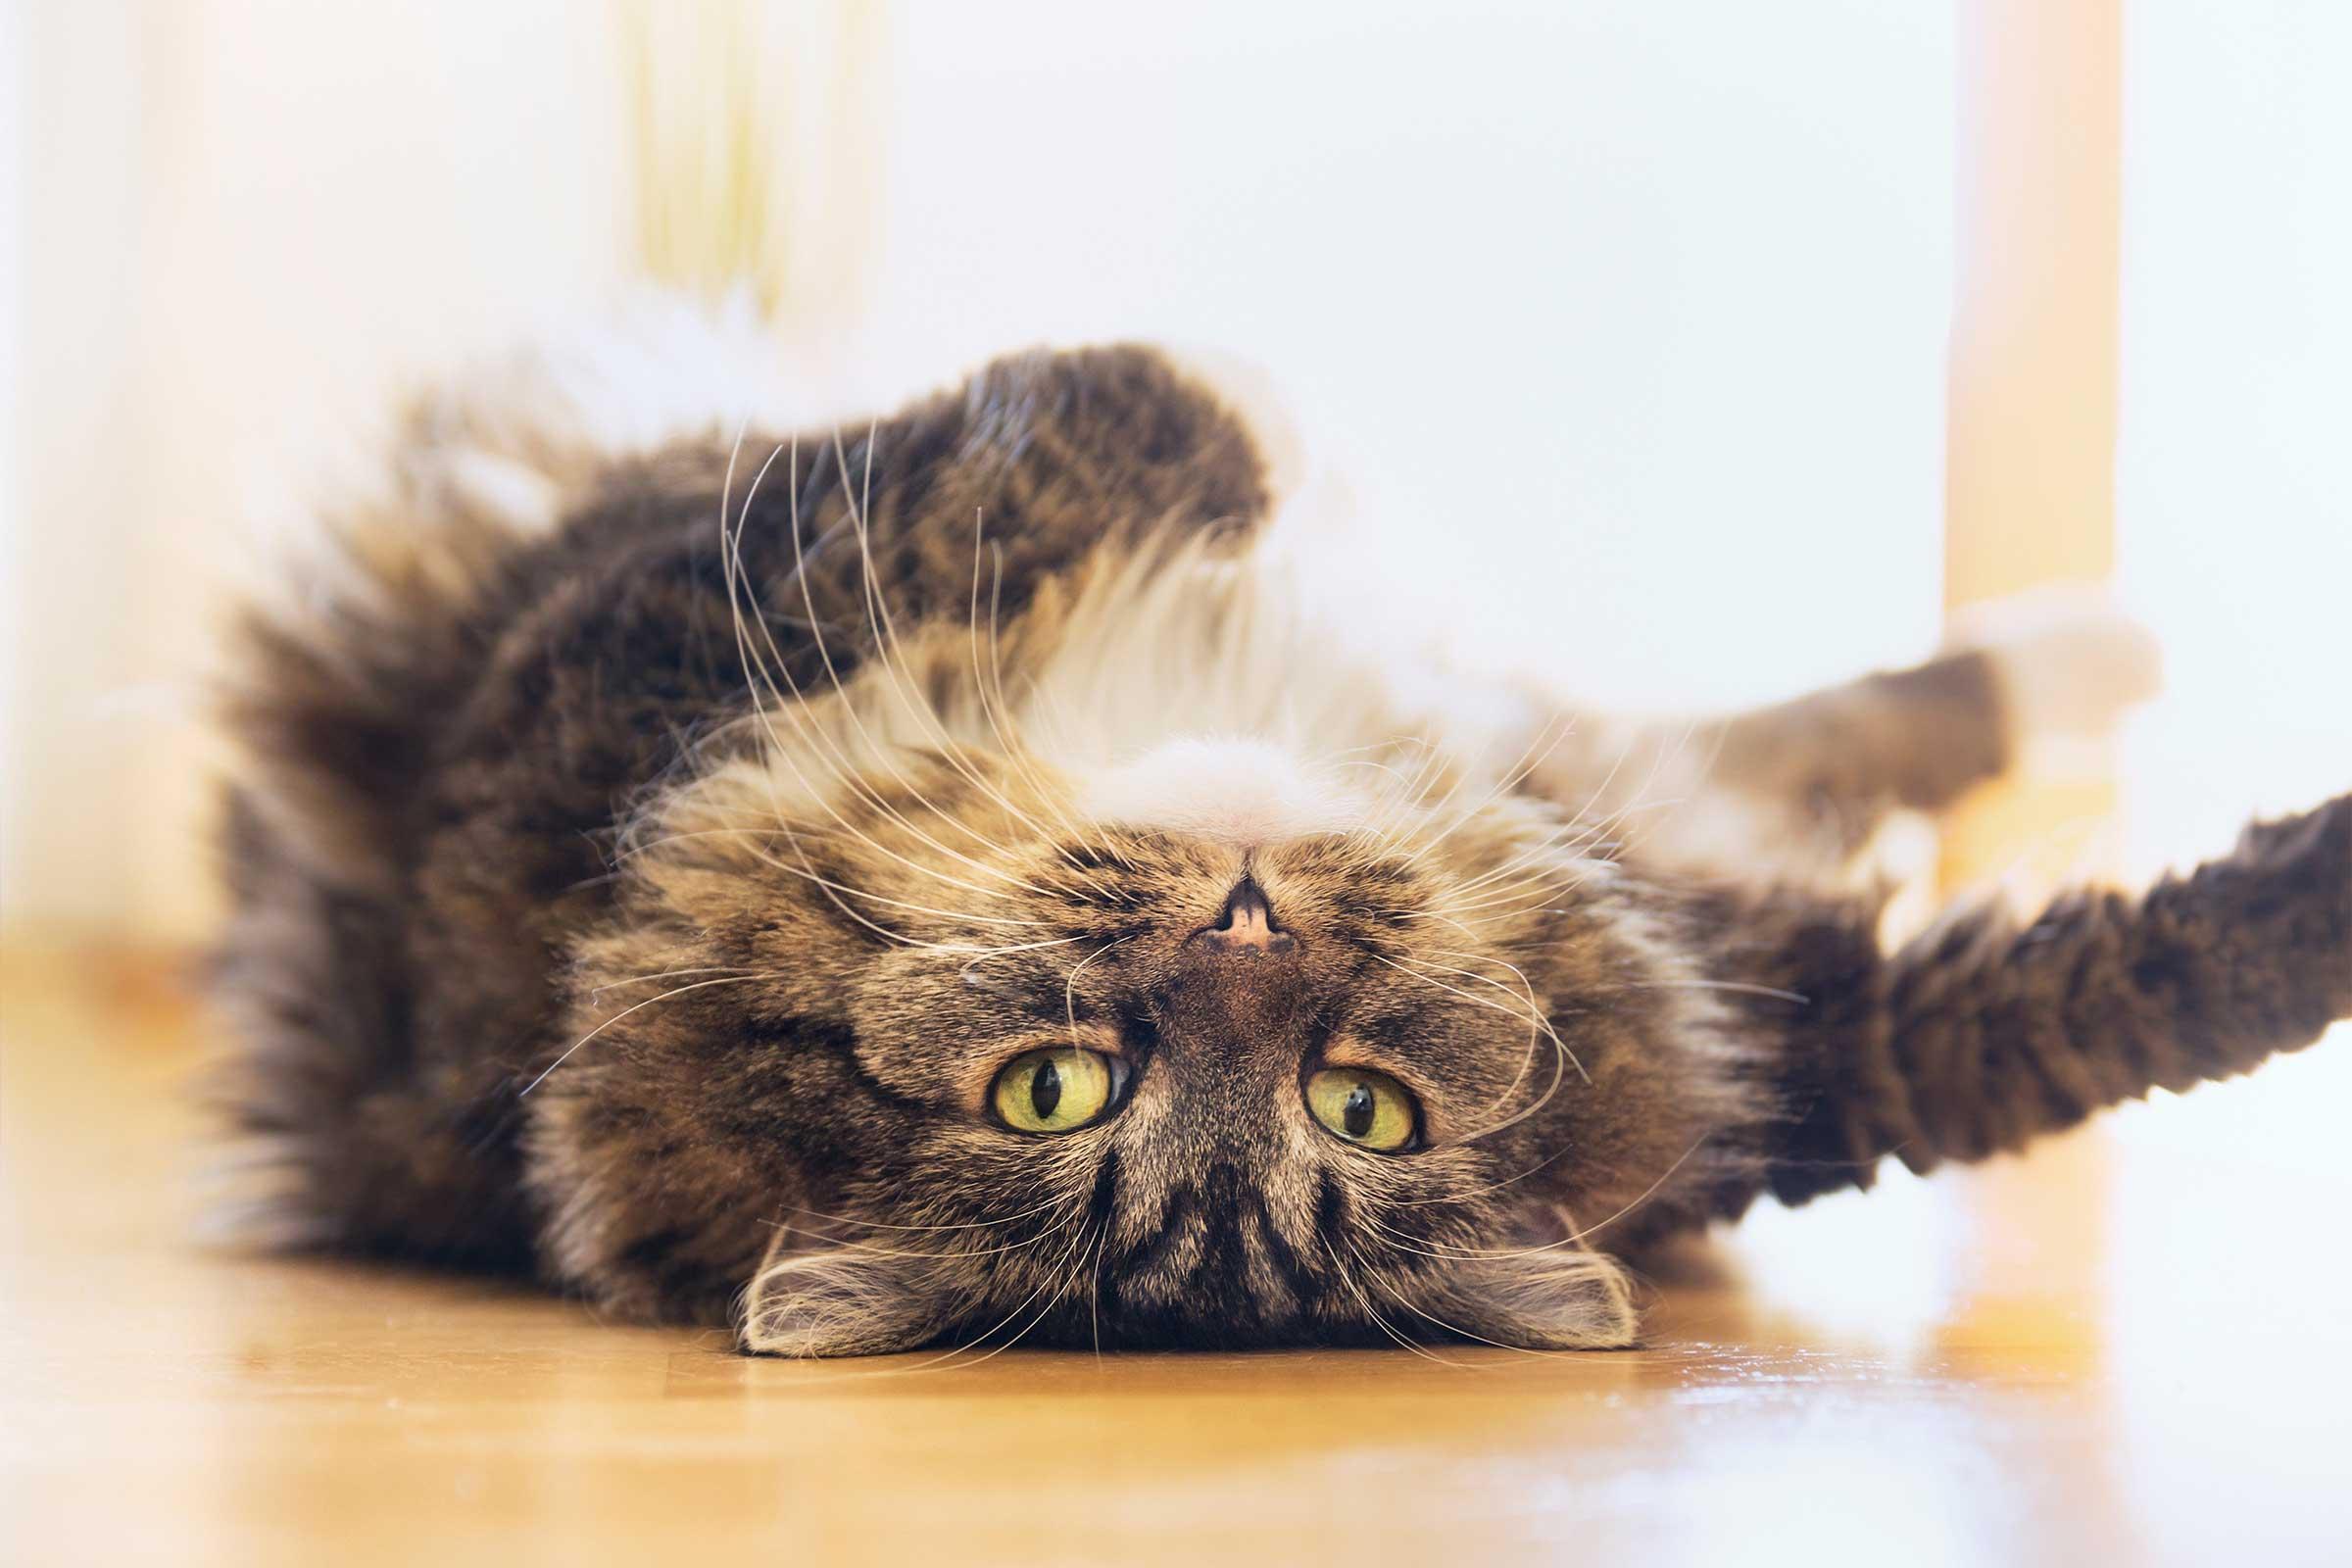 Ciri-ciri Kucing Pesia Berhasil Kawin: Sering Guling-Guling di Atas Lantai